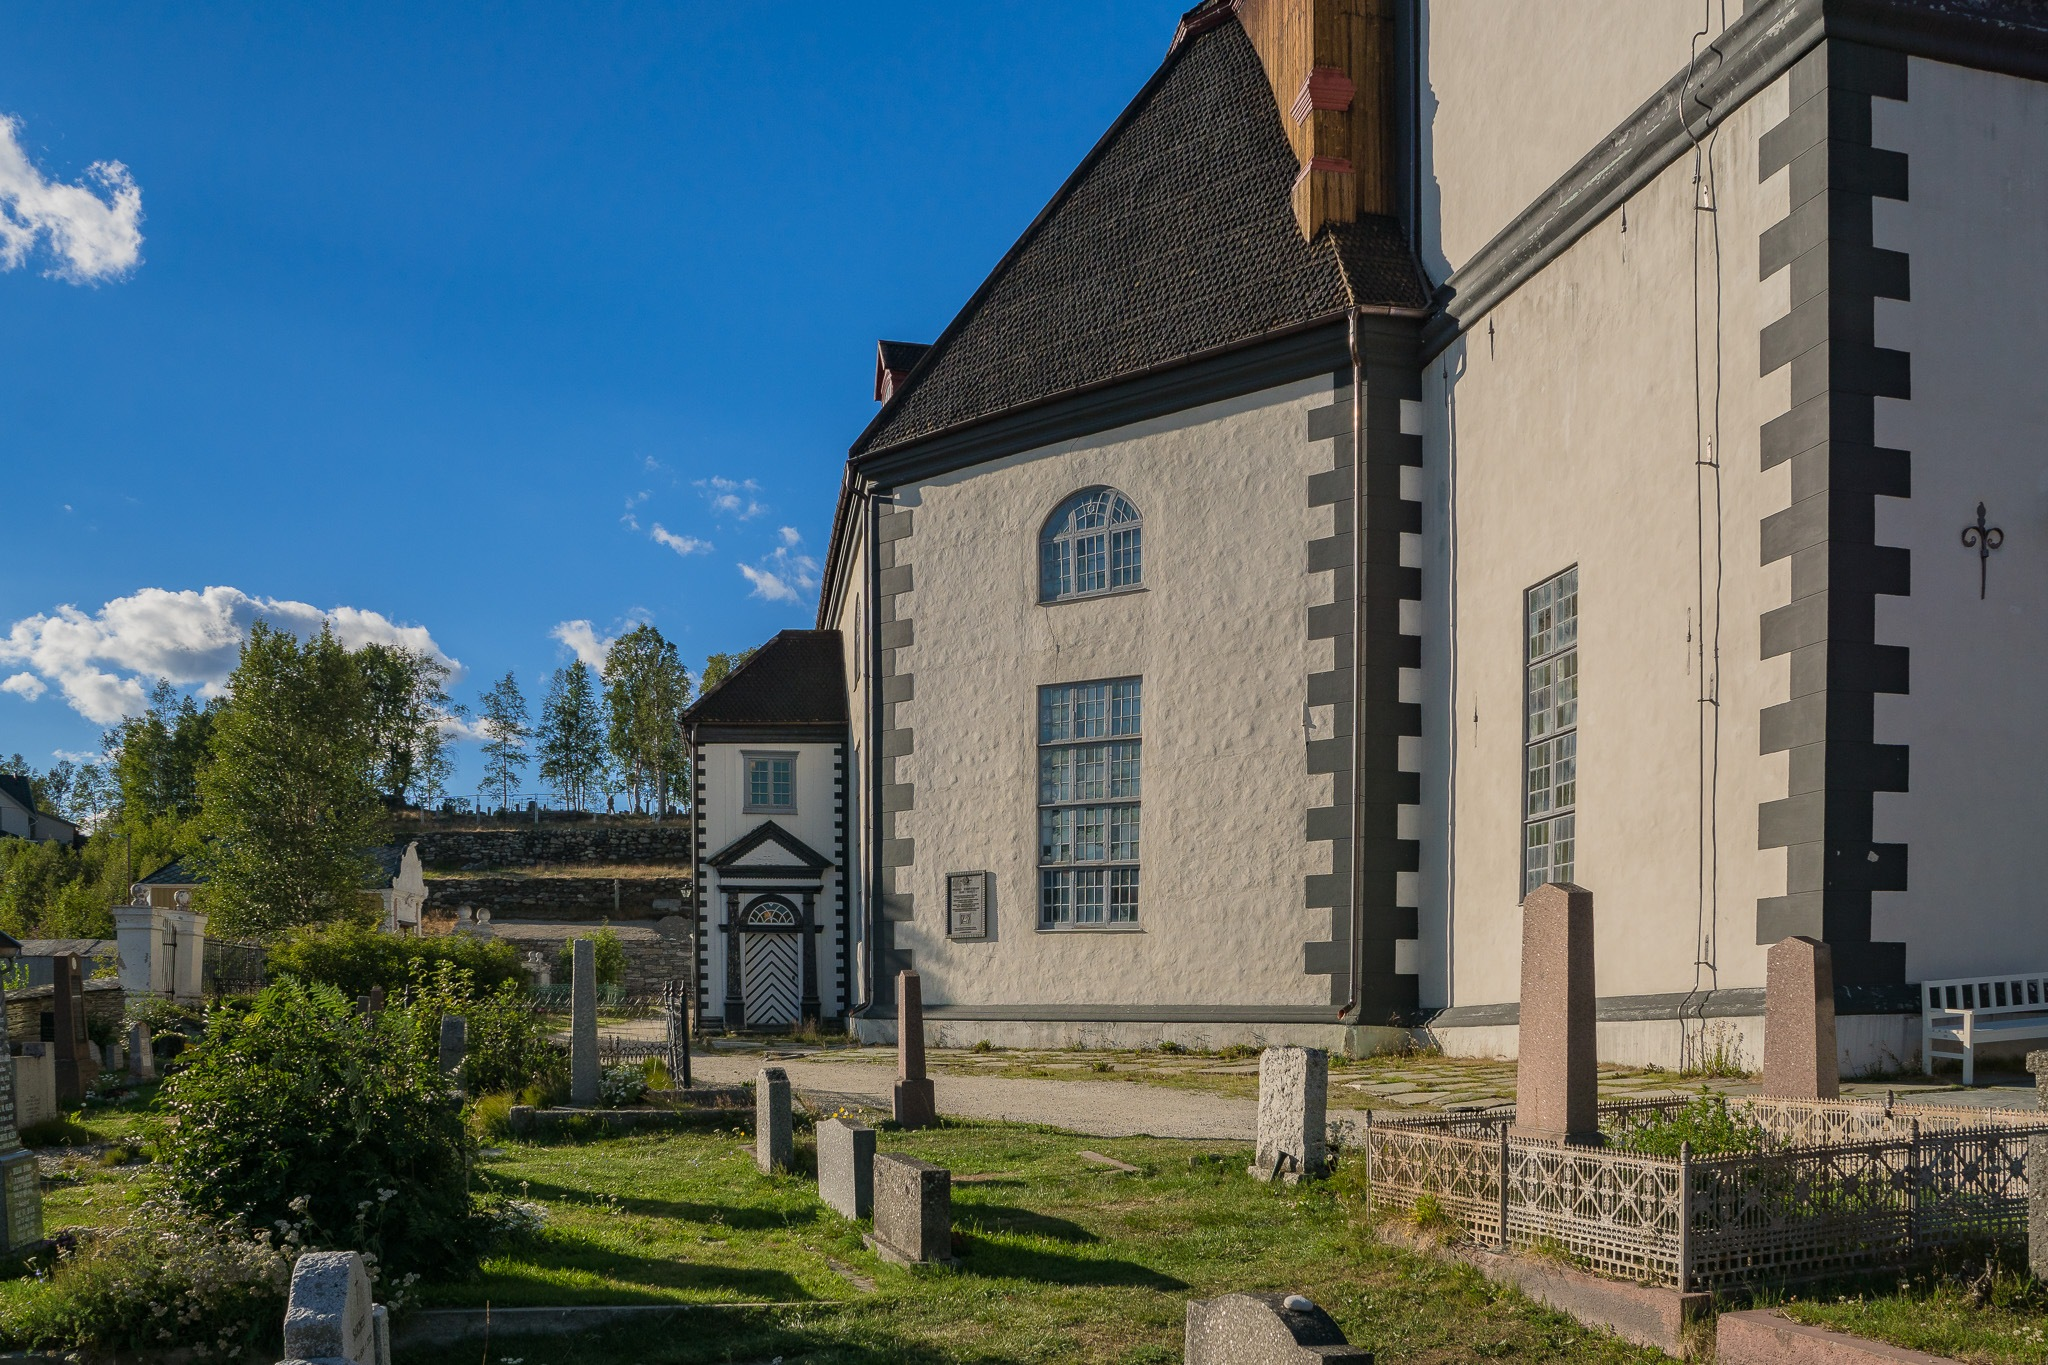 Roeros Church in Norway by Tormod Lindoe